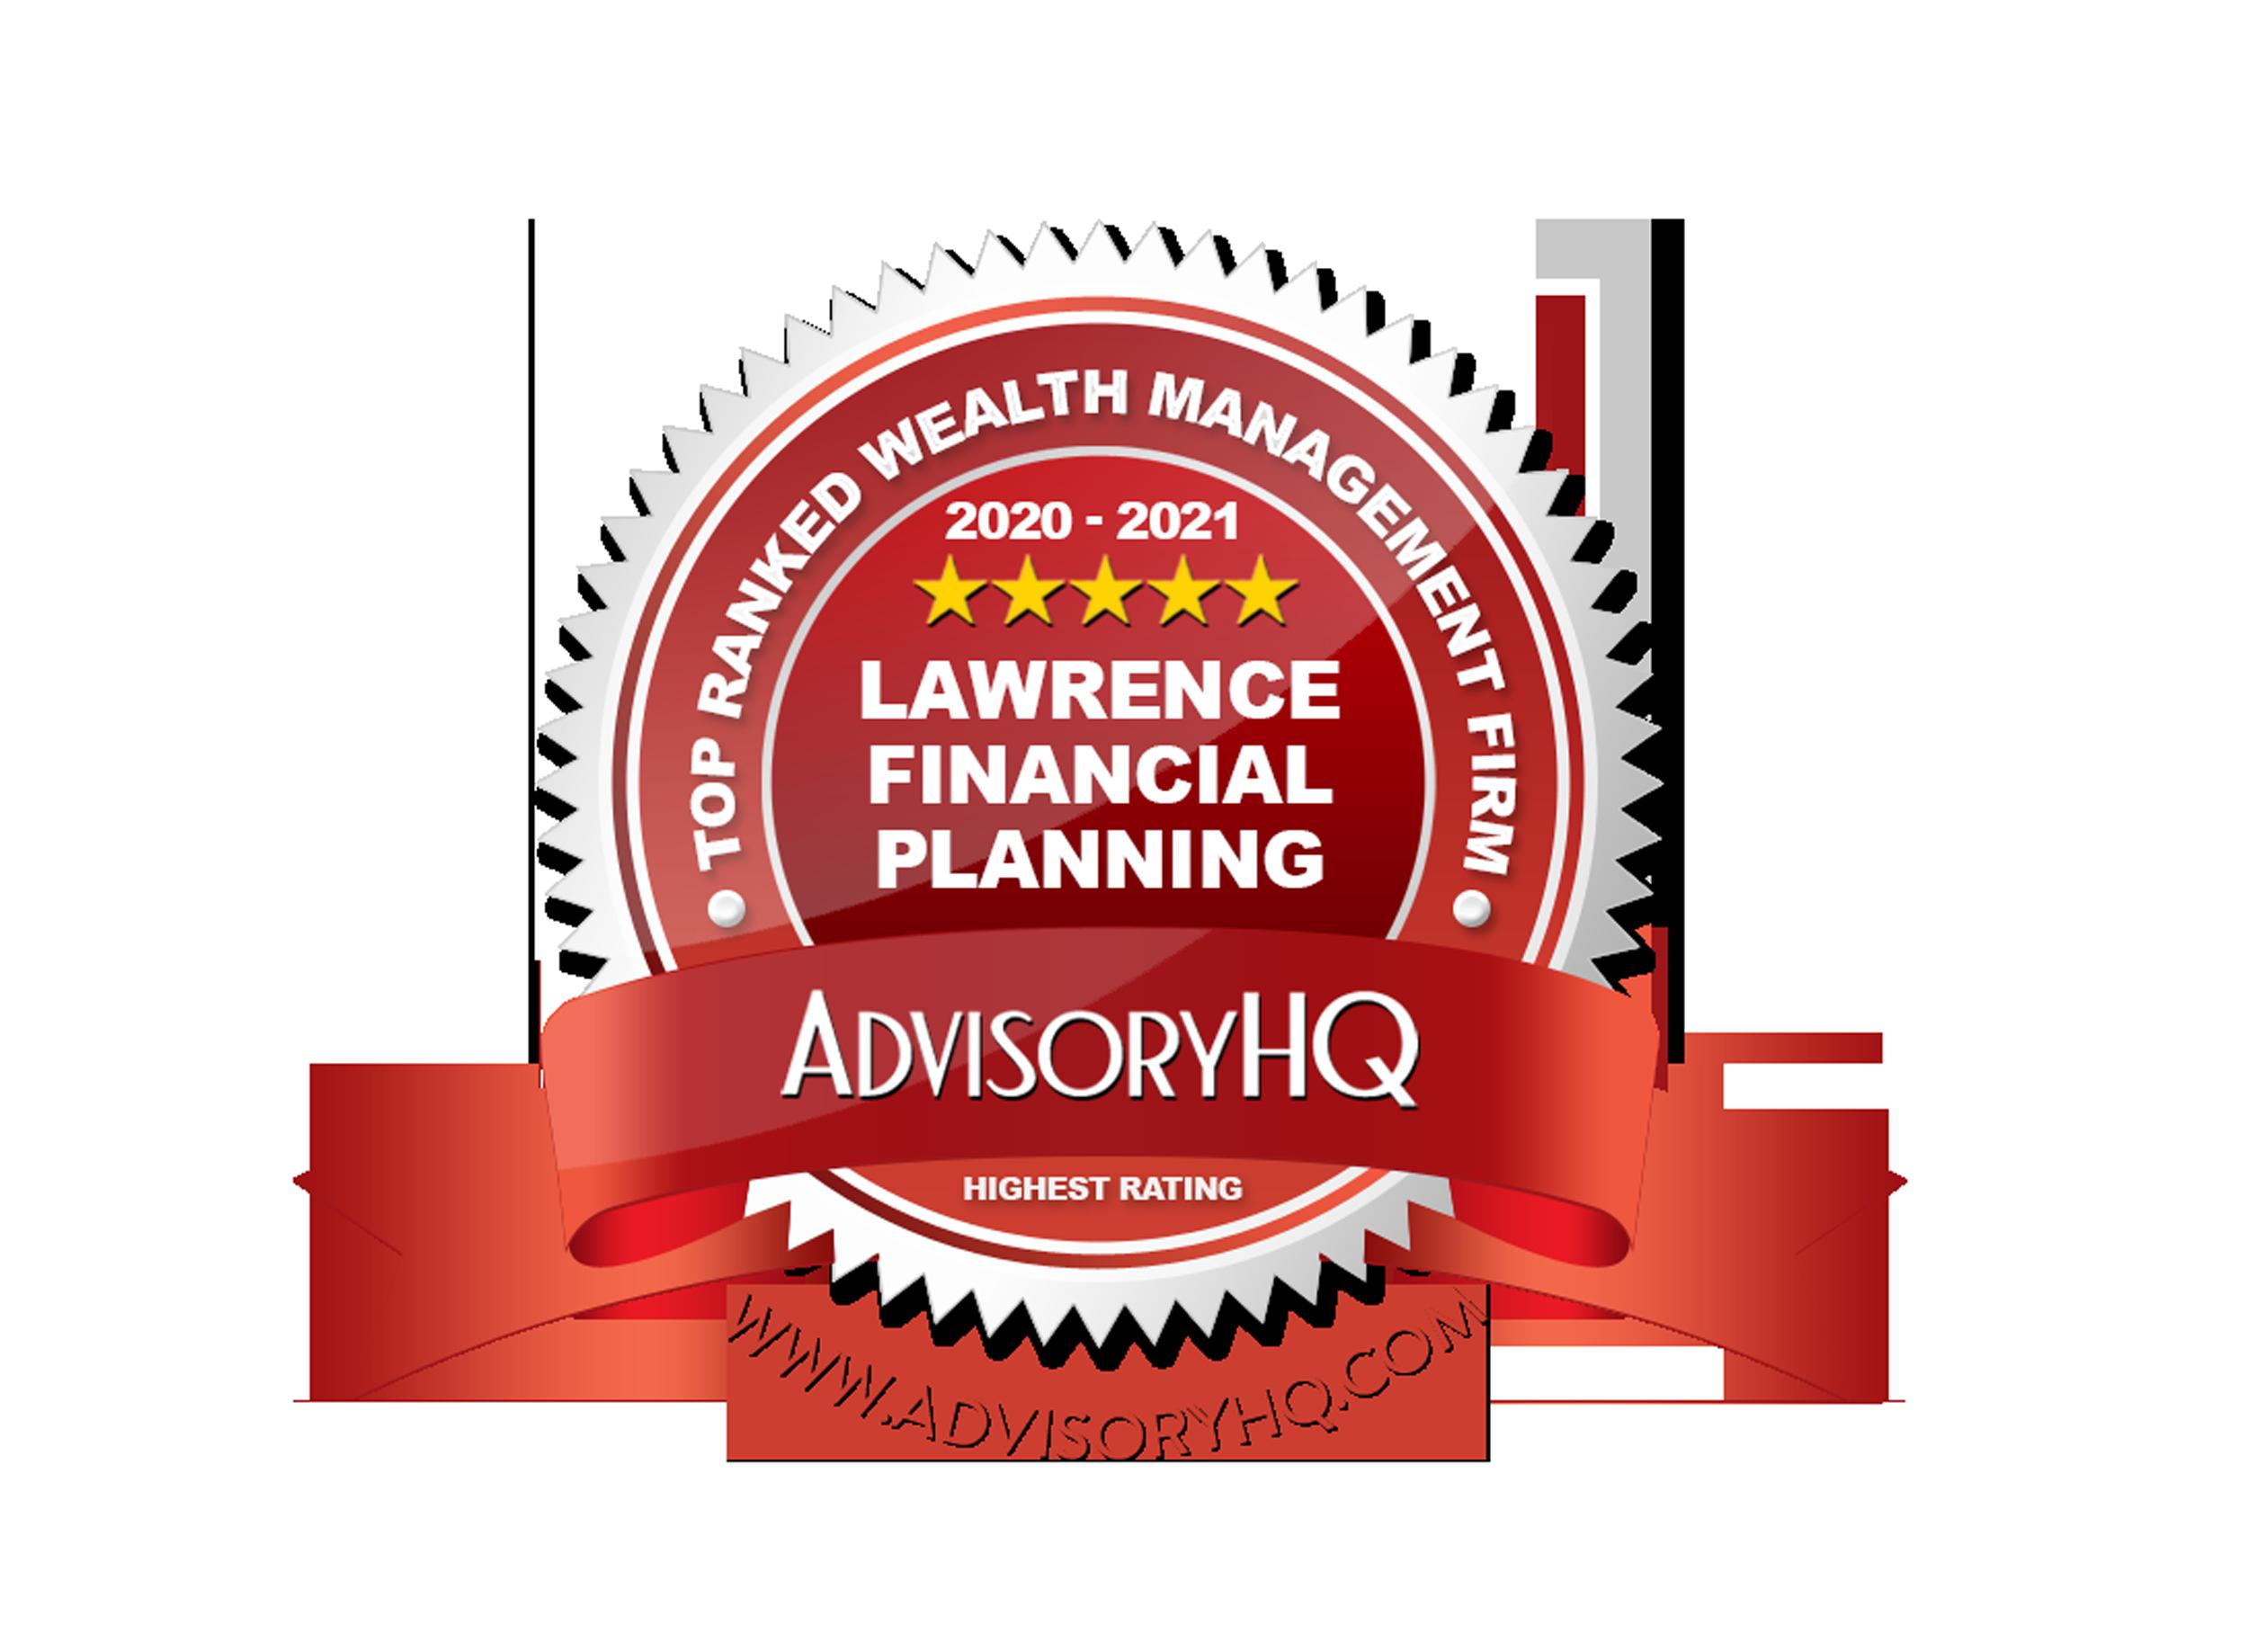 AdvisoryHQ Tampa, FL Lawrence Financial Planning